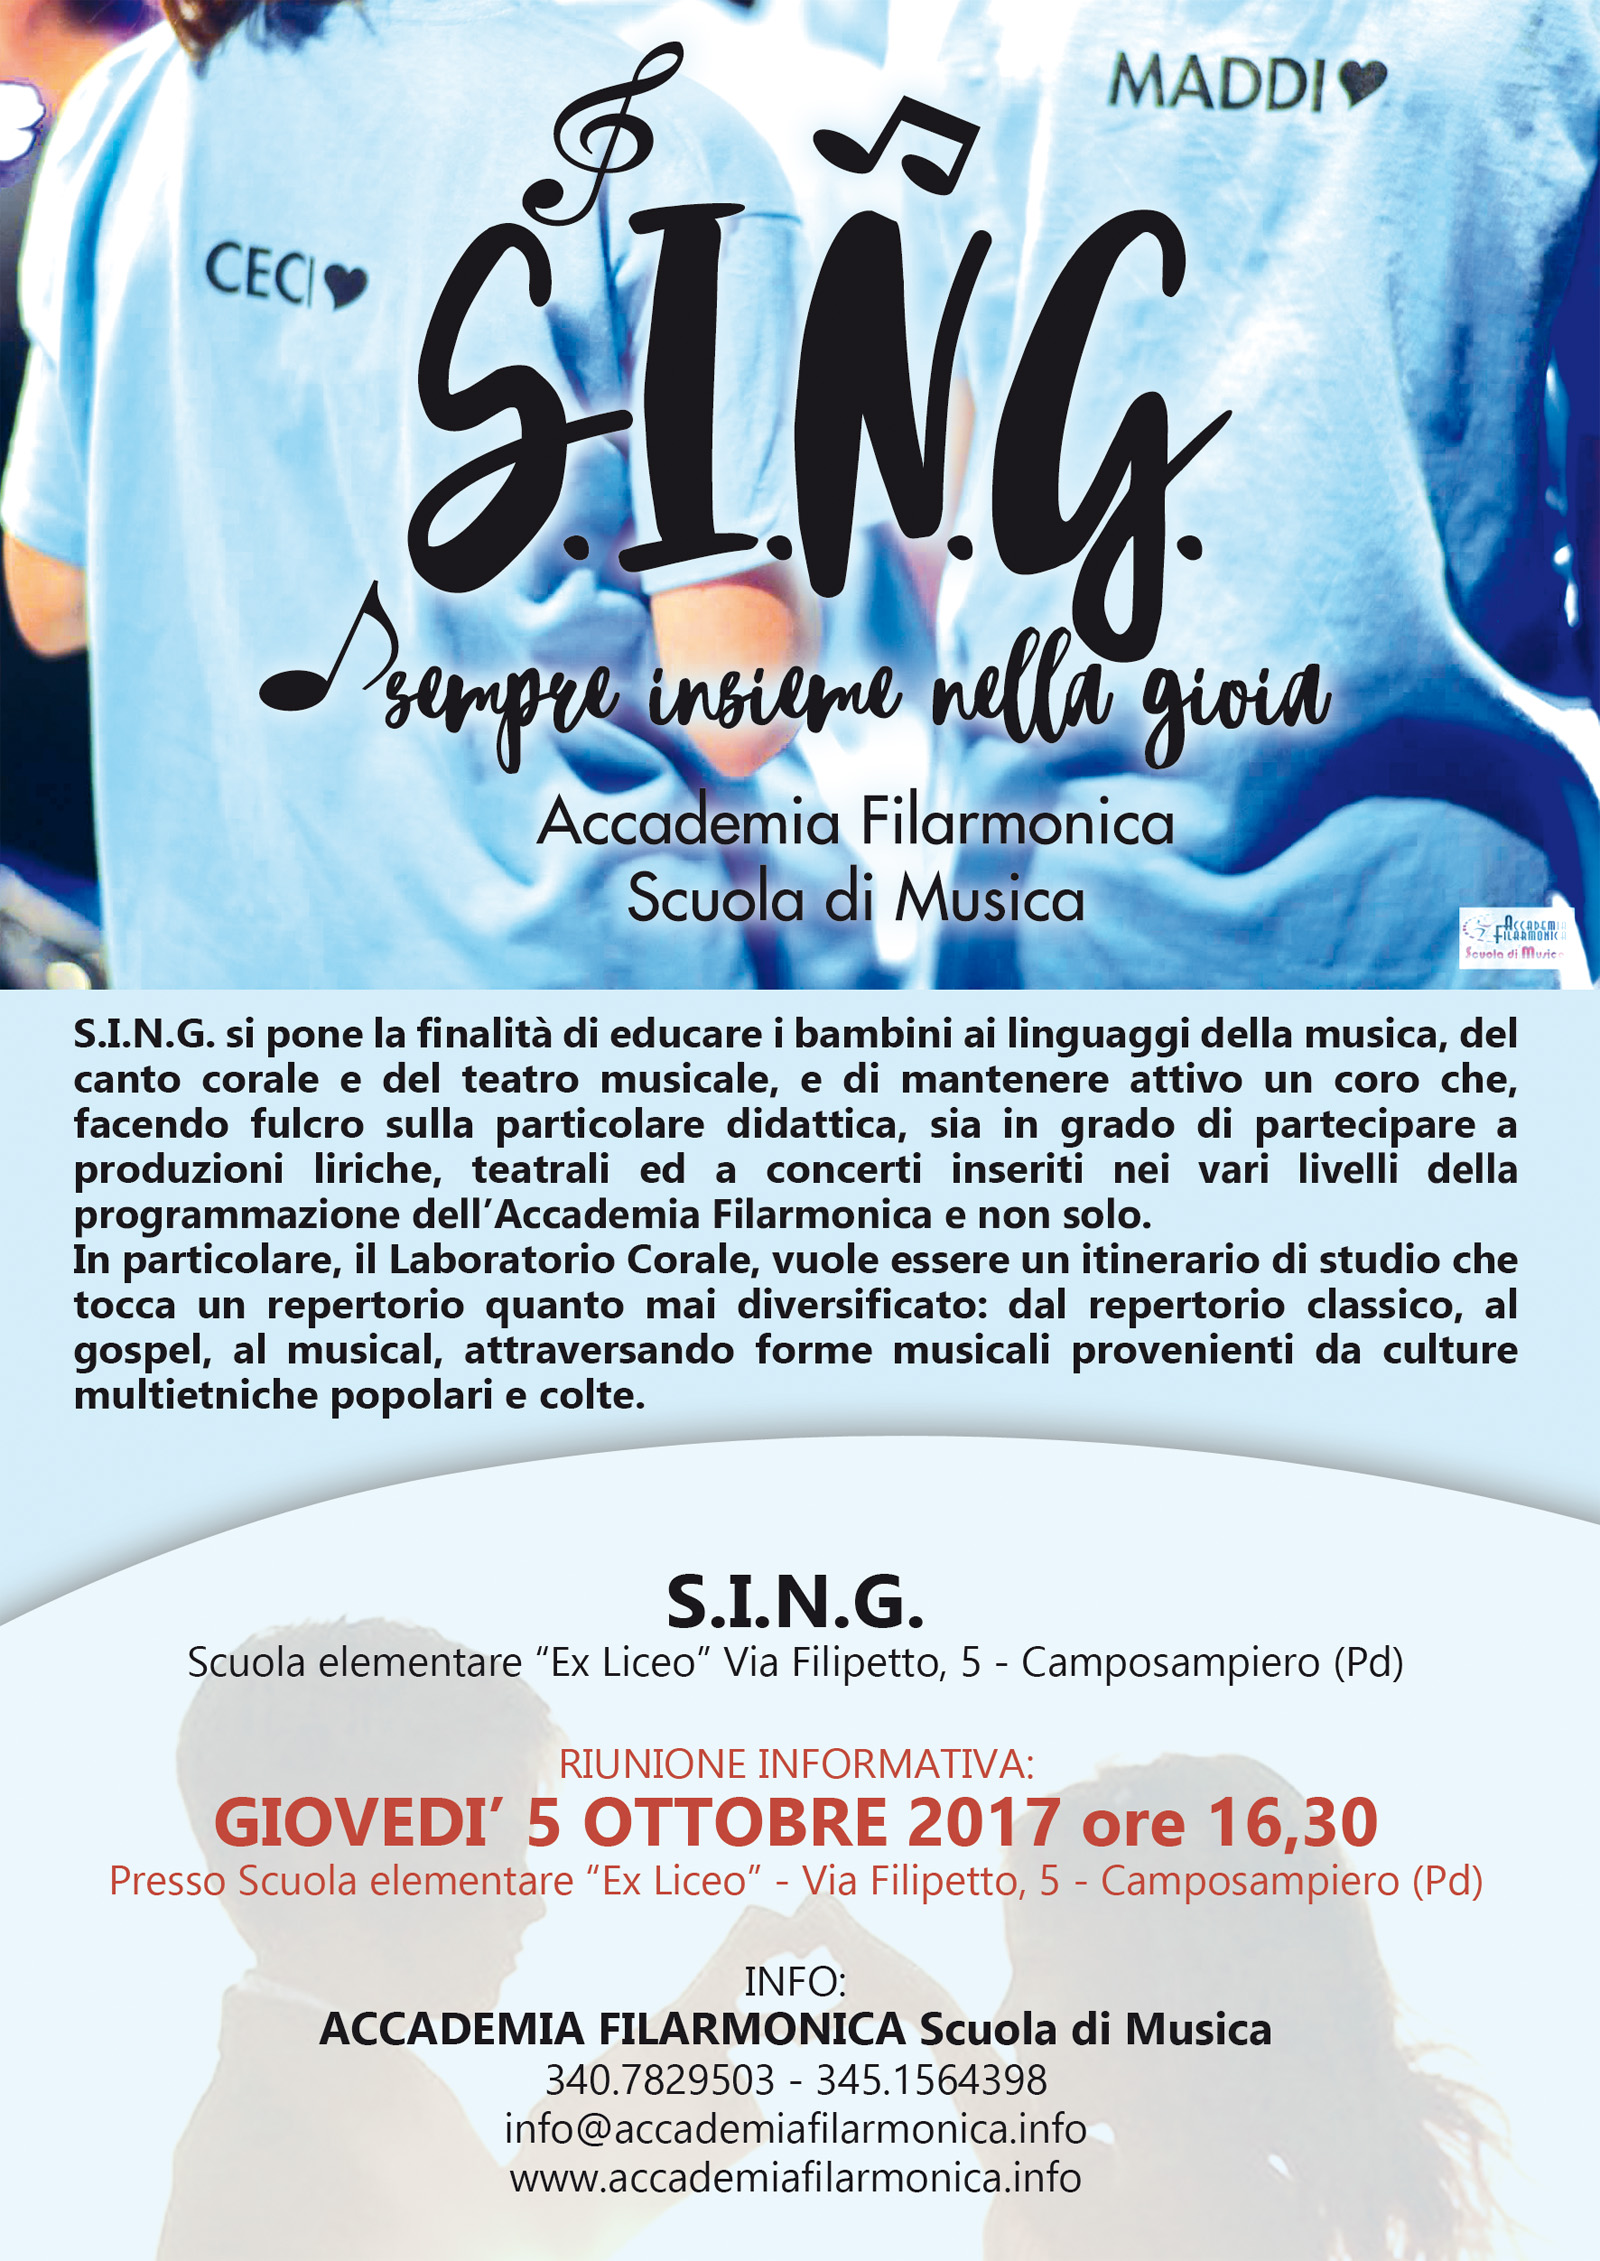 Sing Accademia Filarmonica